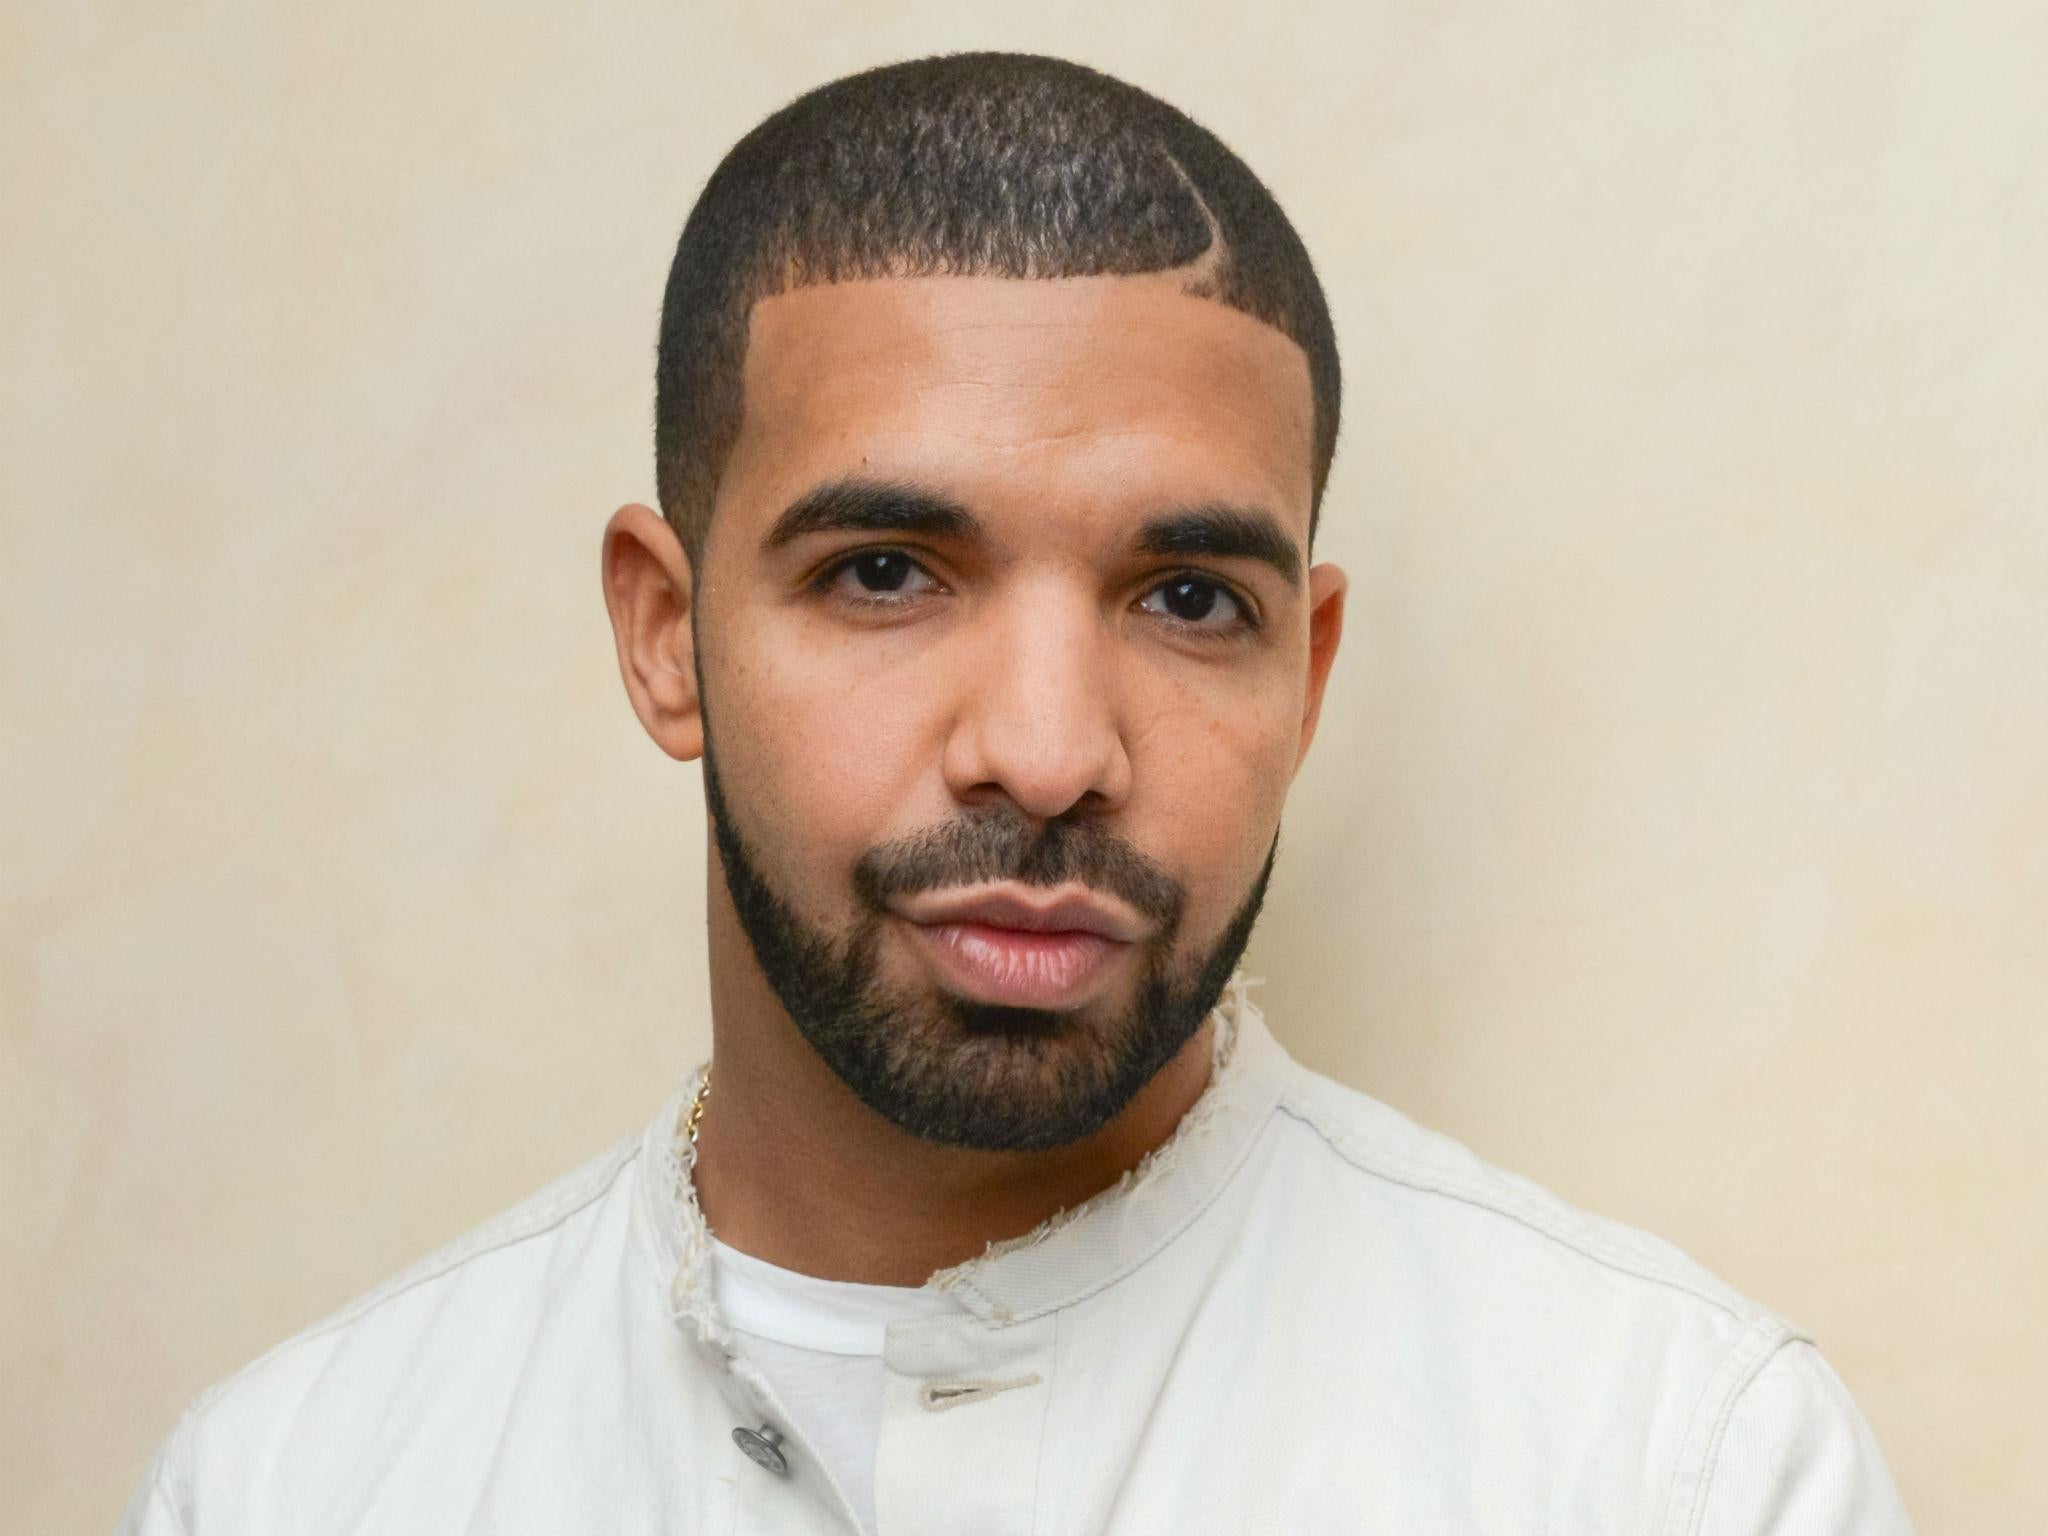 Drake lyrics on Scorpion track 'Emotionless' confirms he has a son